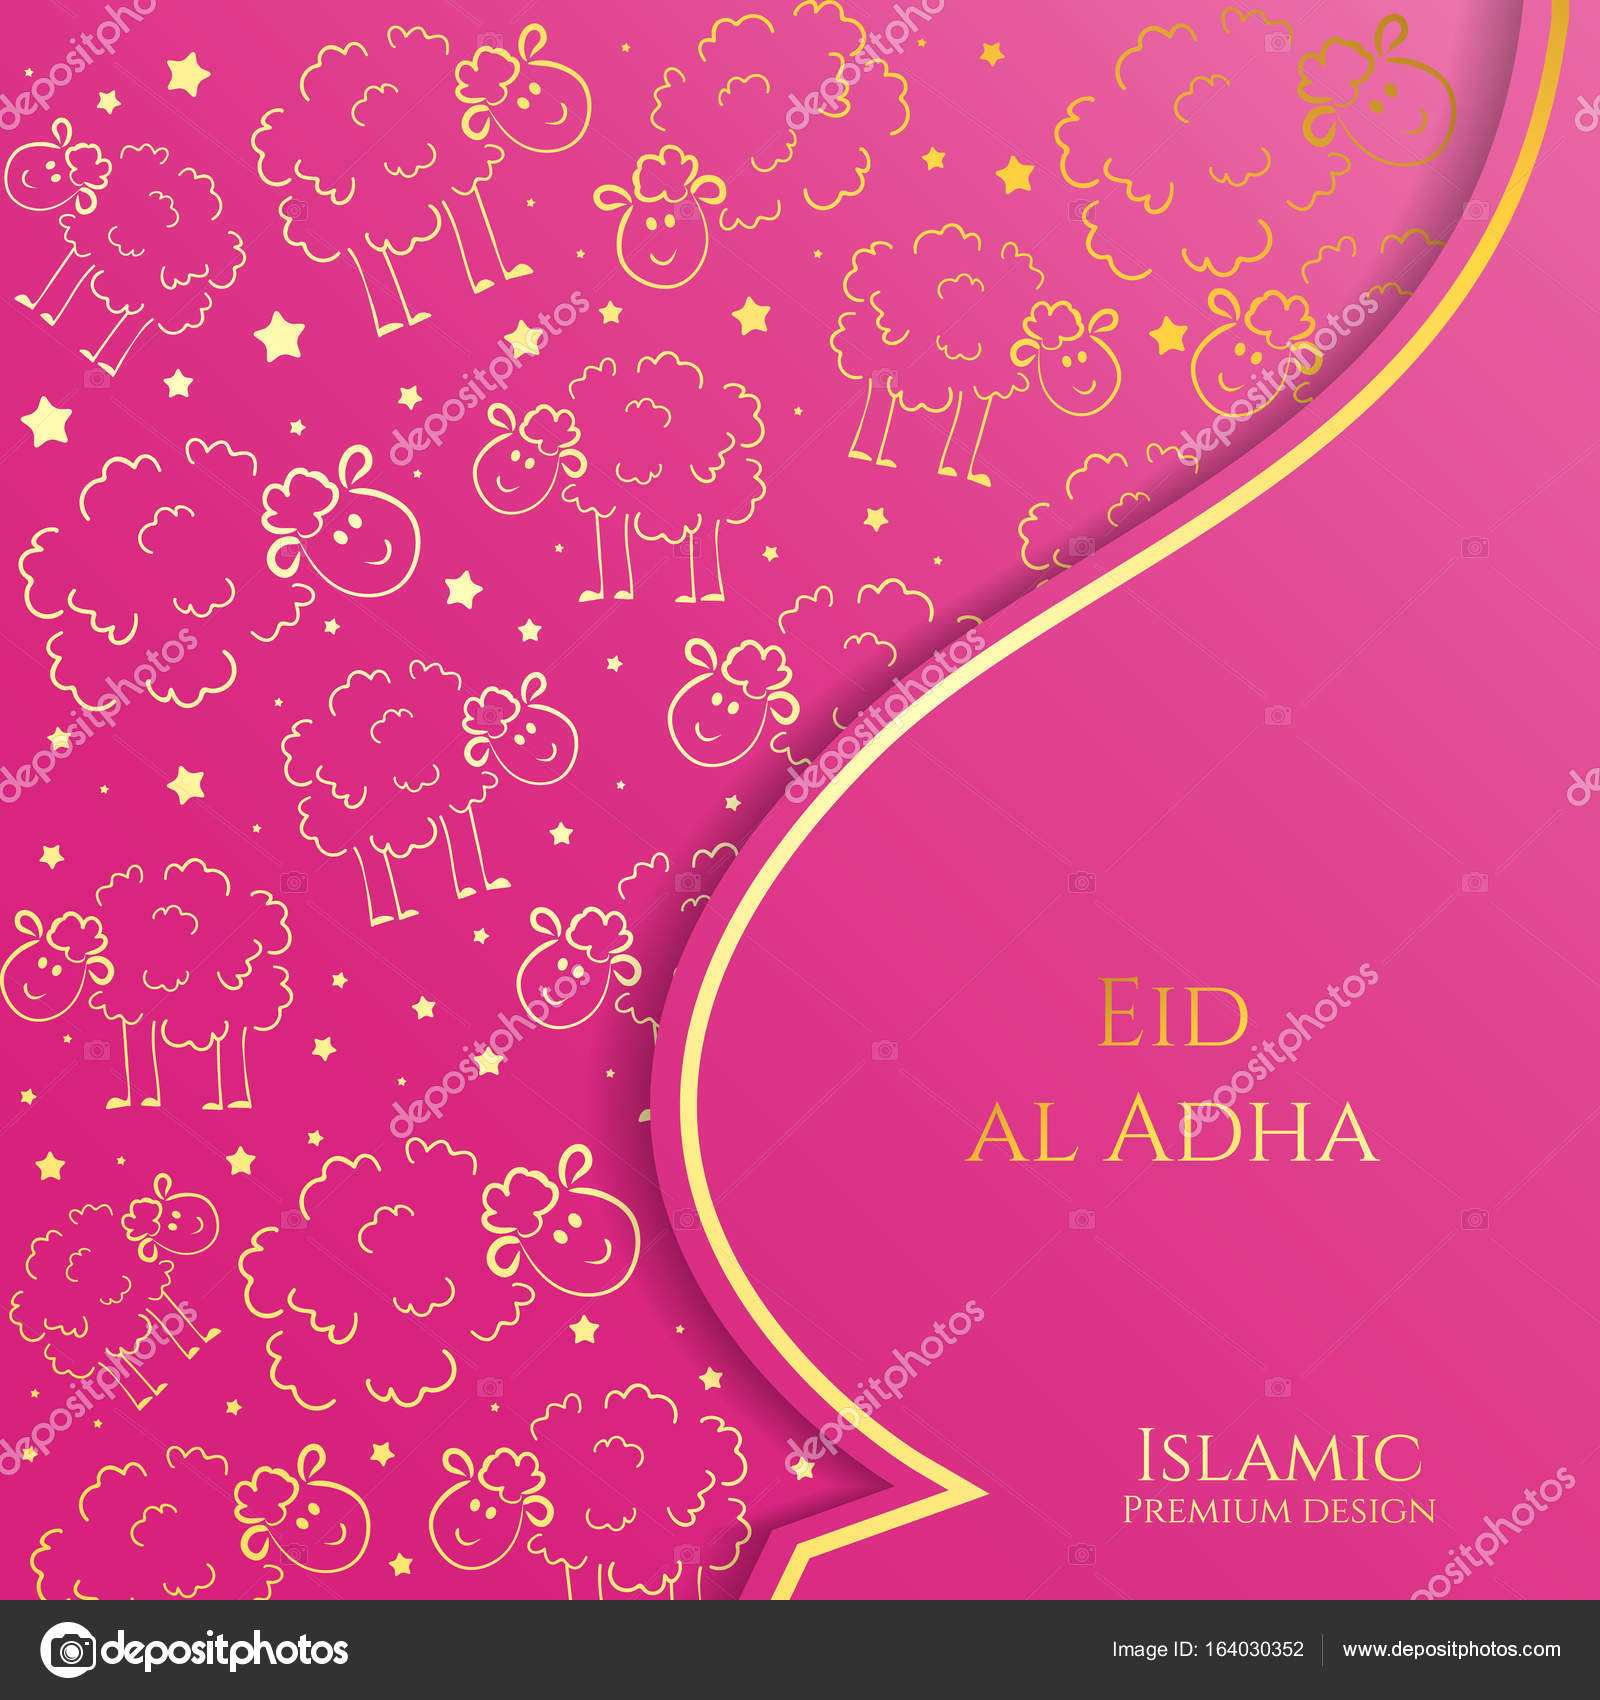 1439 hijri islamic new year happy muharram muslim community 1439 hijri islamic new year happy muharram muslim community festival eid al ul adha mubarak greeting card with 3d paper flower star moon kristyandbryce Images